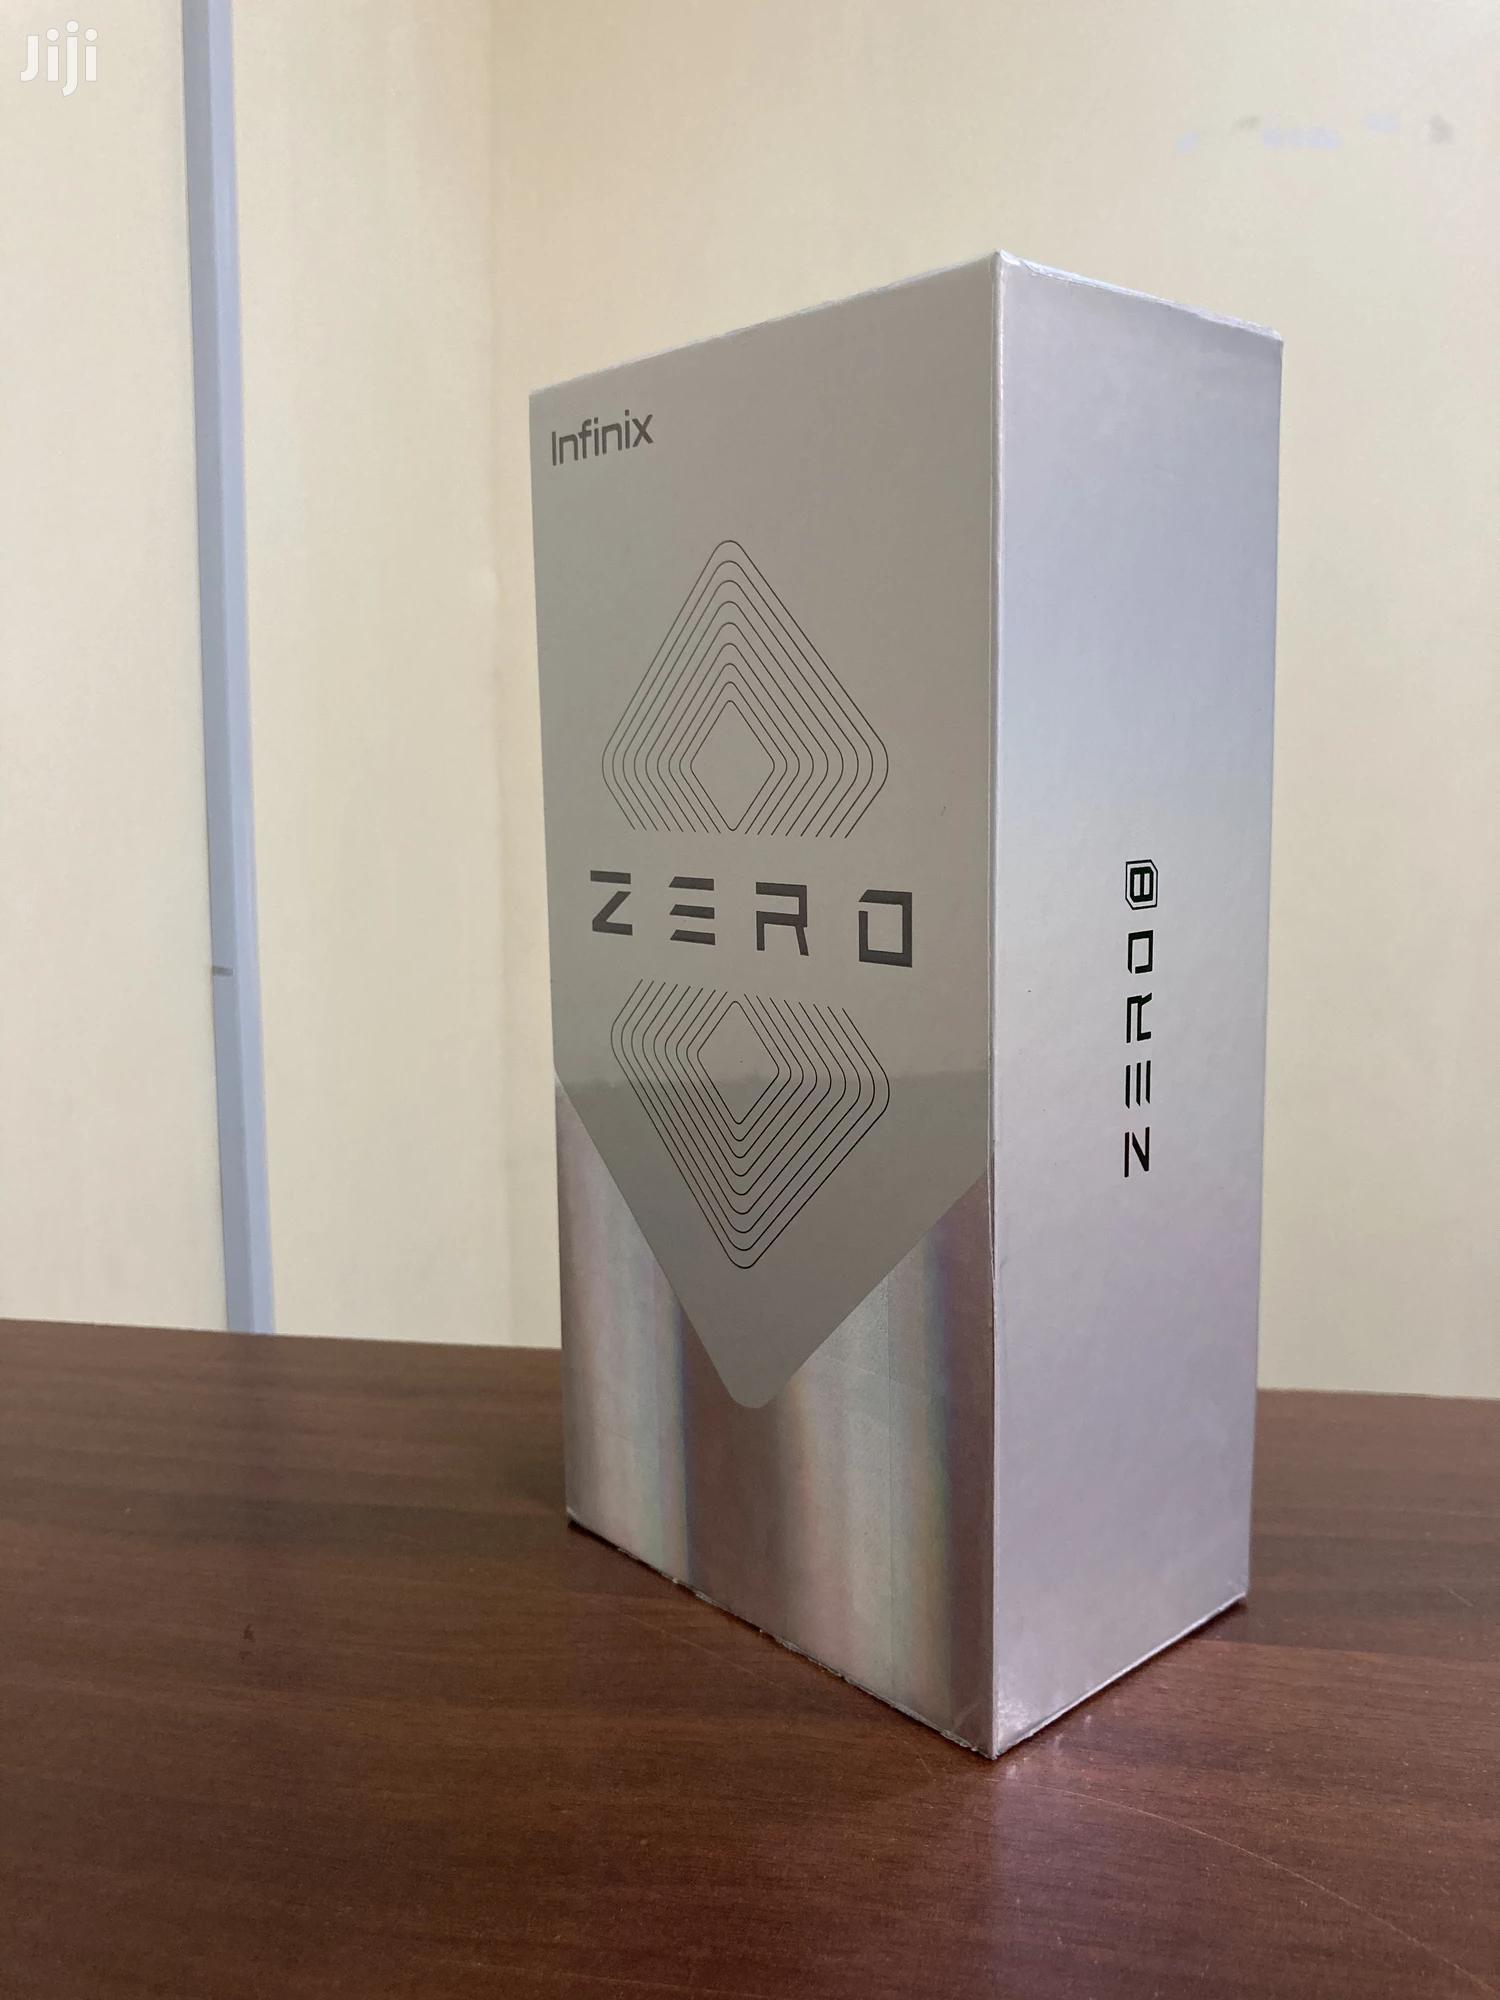 New Infinix Zero 8 128 GB | Mobile Phones for sale in Nairobi Central, Nairobi, Kenya